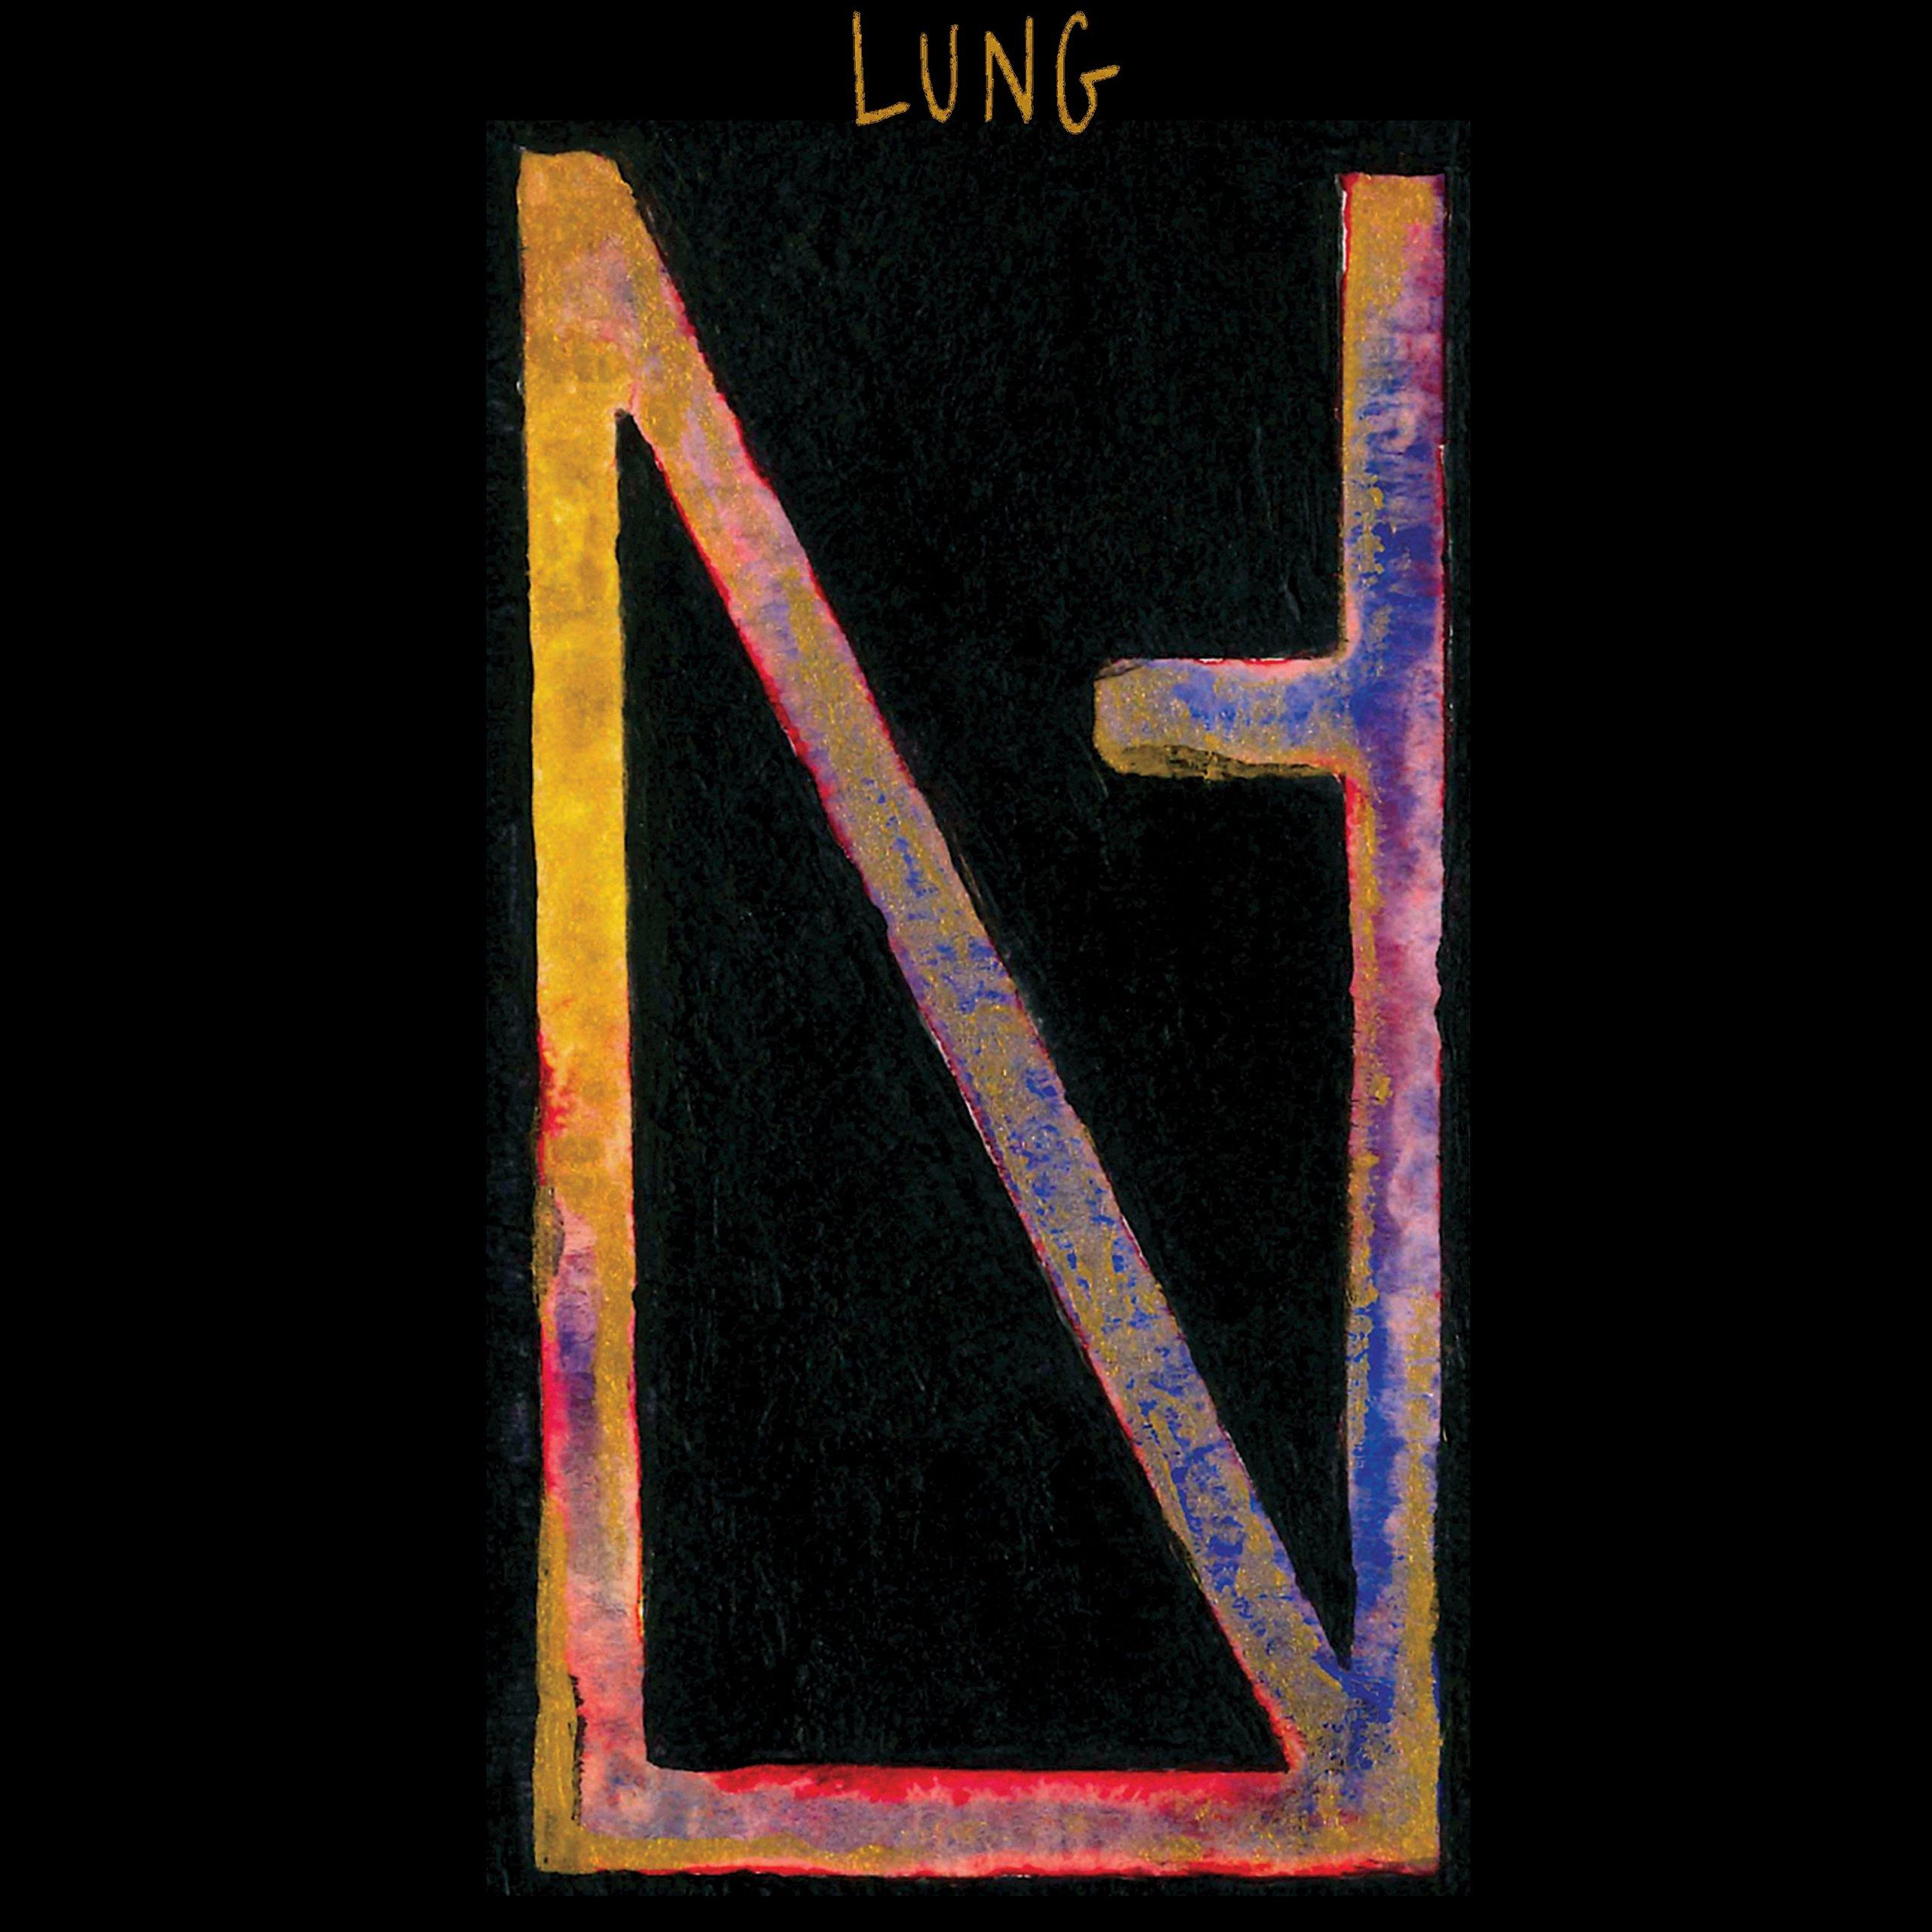 Vinilo : Lung - All The Kings (LP Vinyl)